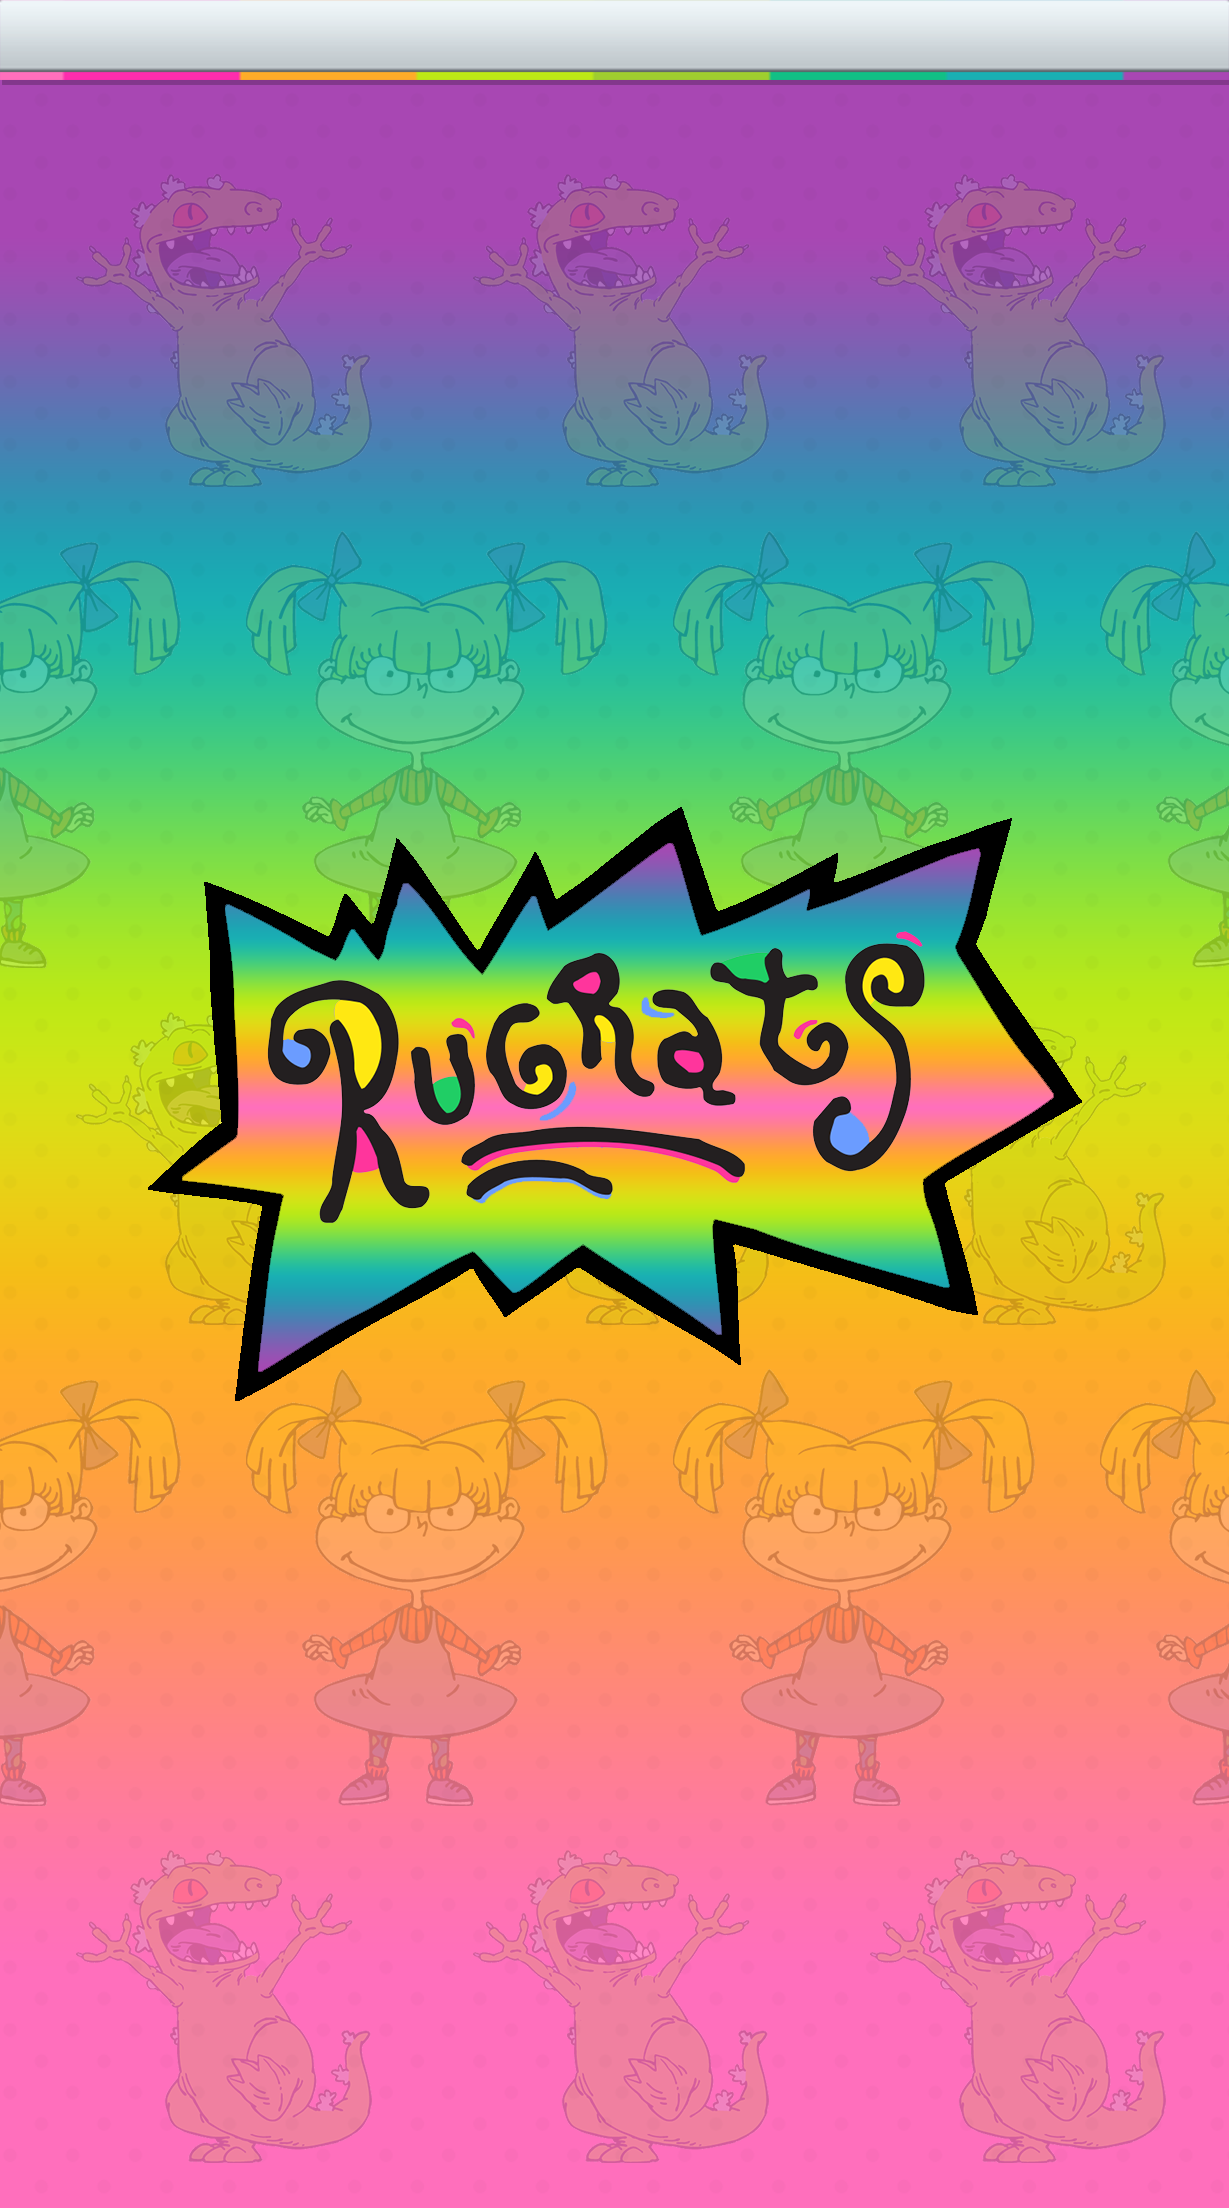 Rugrats Wallpaper Cartoon wallpaper iphone, Cartoon